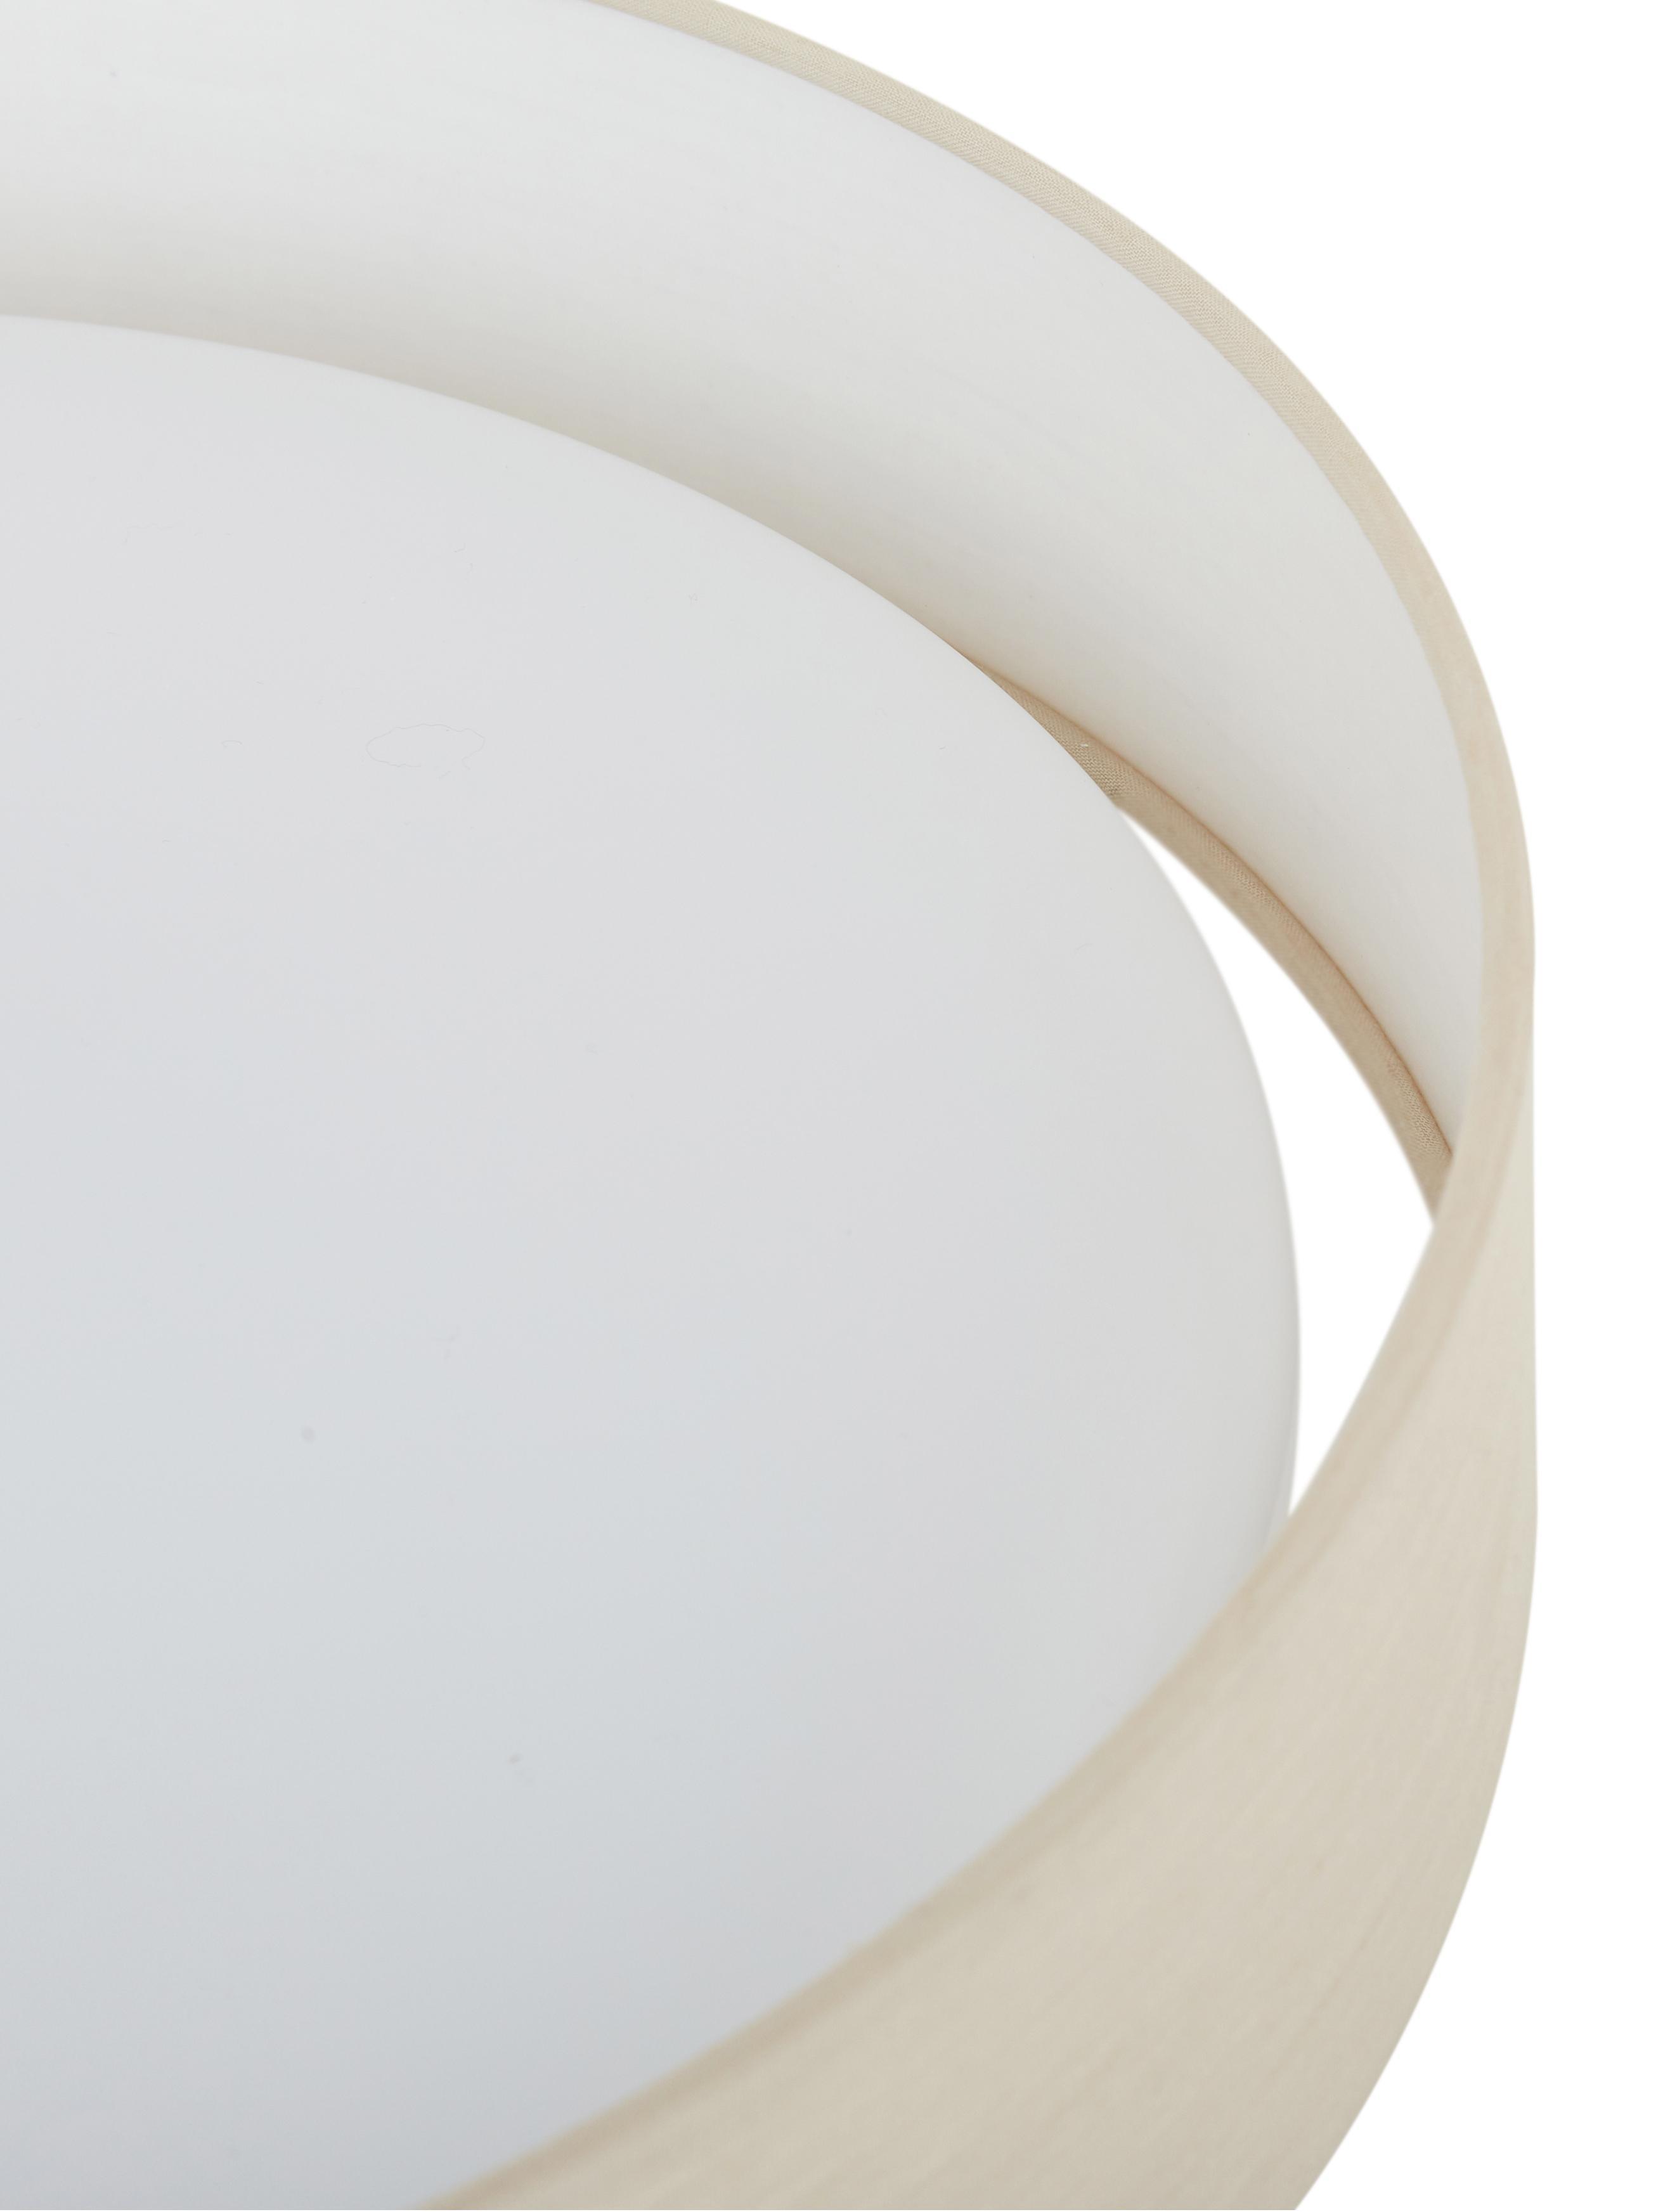 Lampa sufitowa LED Helen, Taupe, Ø 35 x W 7 cm